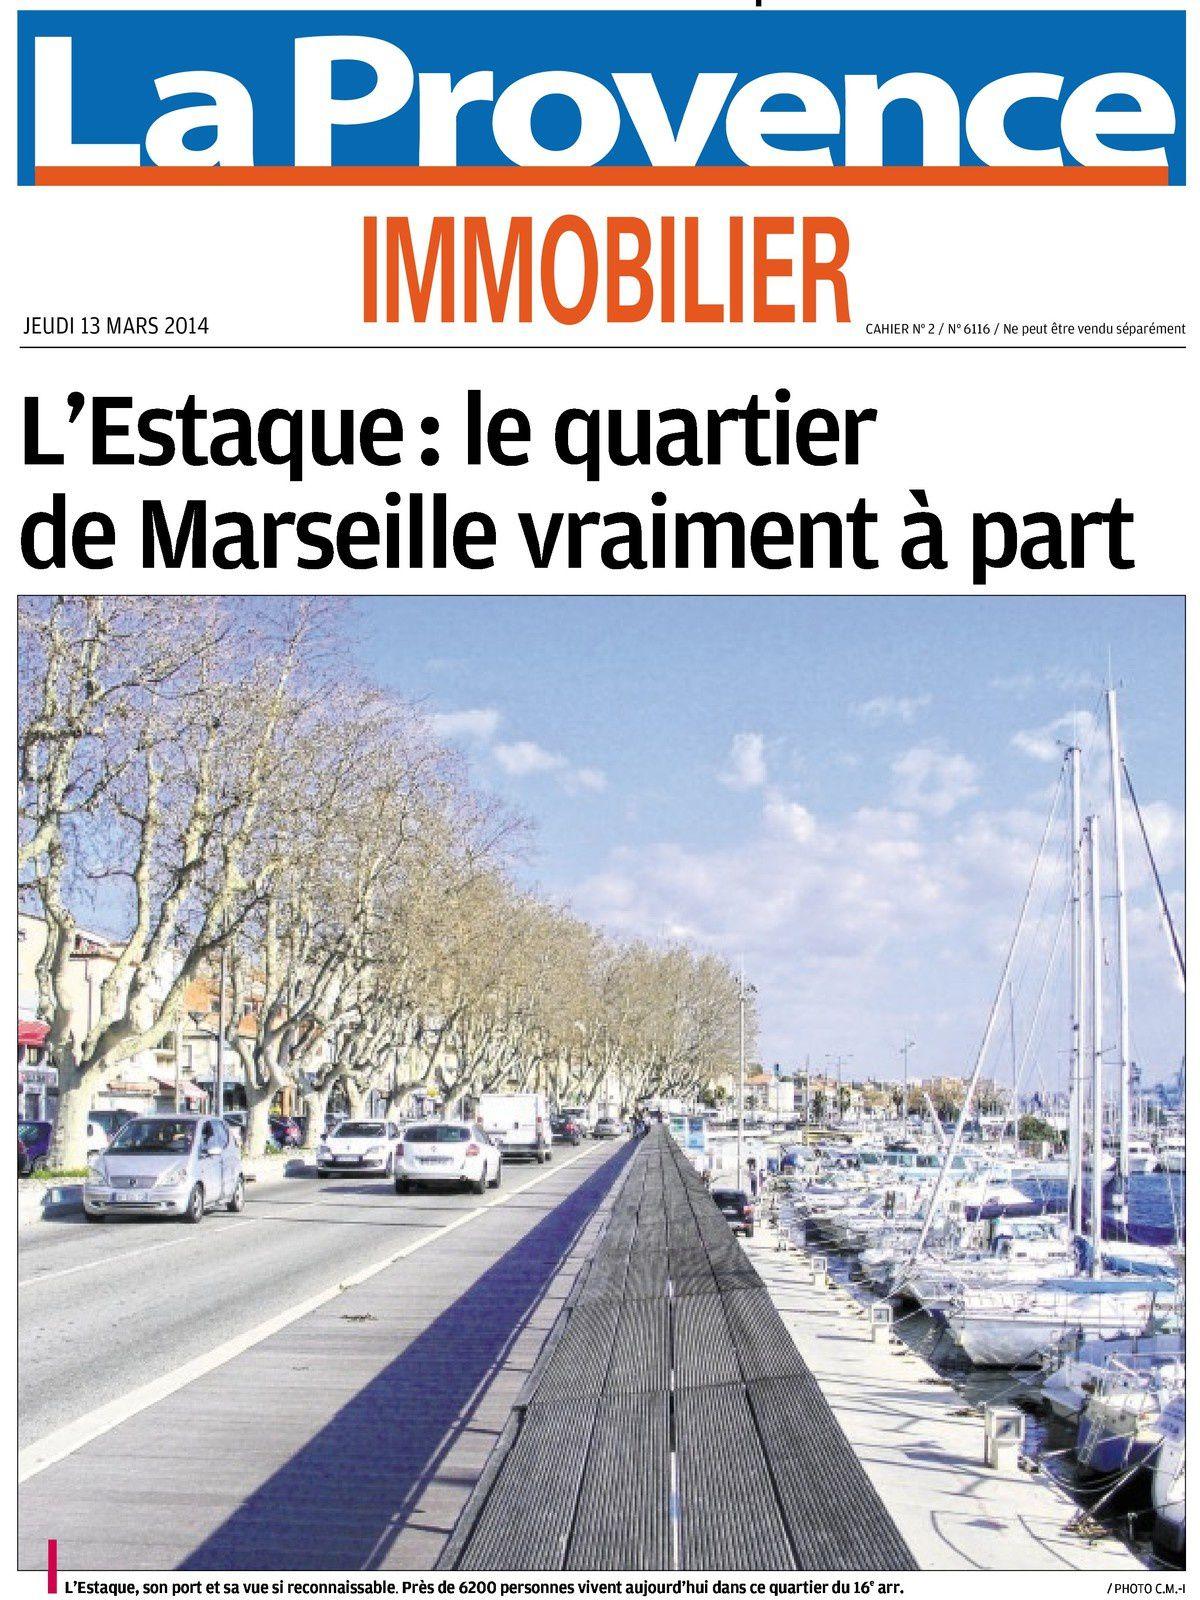 La Provence Immobilier 13 mars 2014